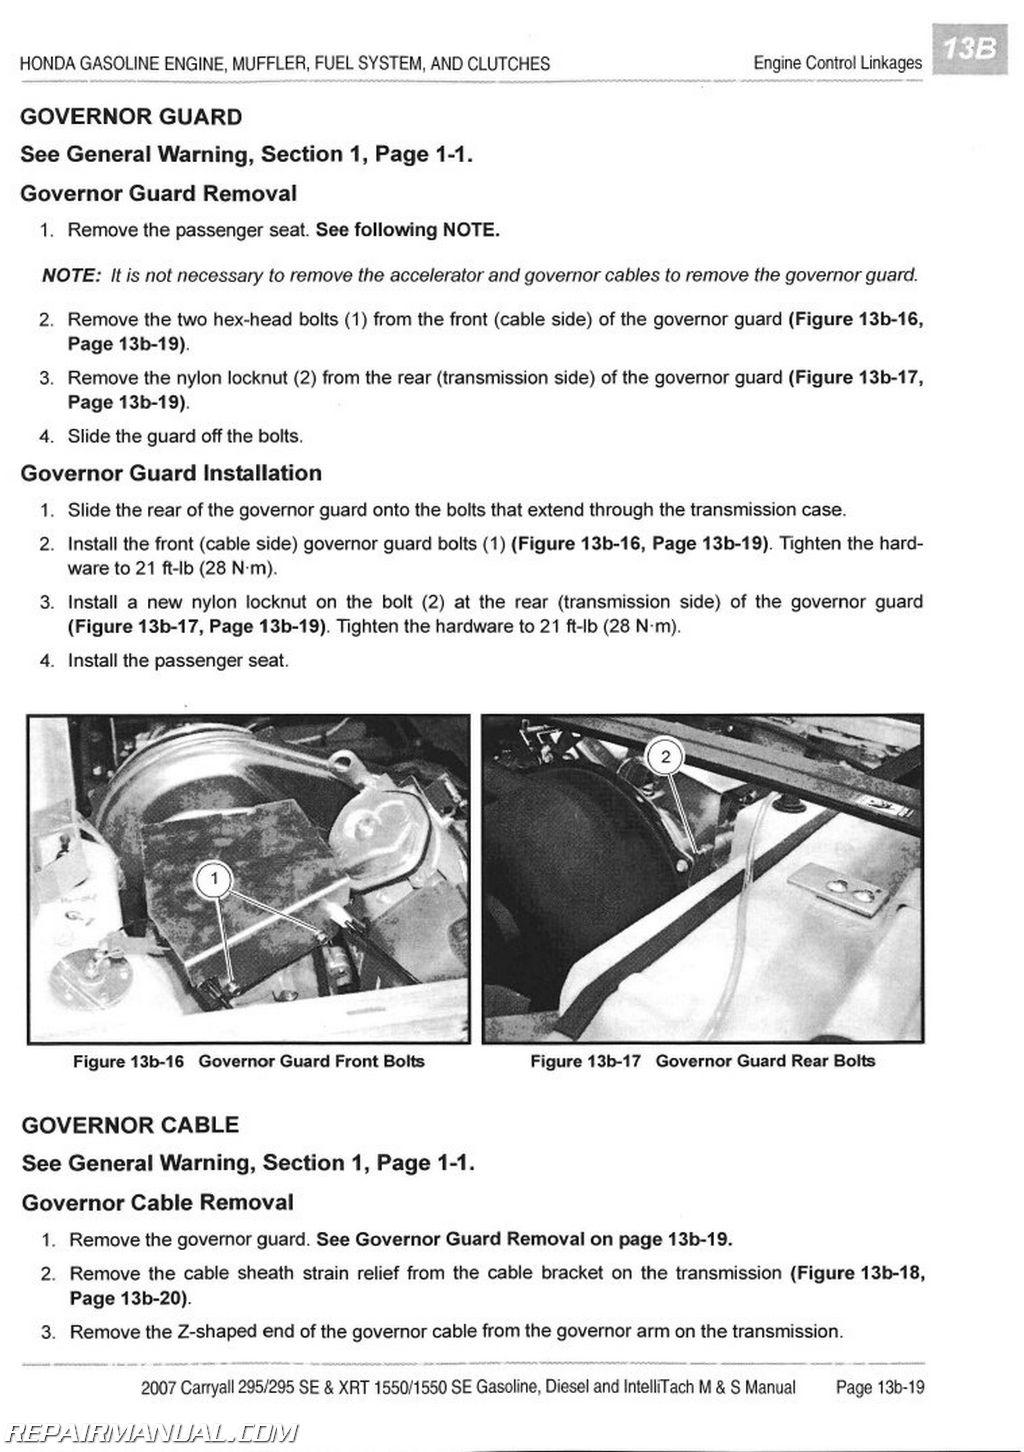 club car gas wiring diagram citroen berlingo alternator 2007 carryall service manual 295 295se  xrt